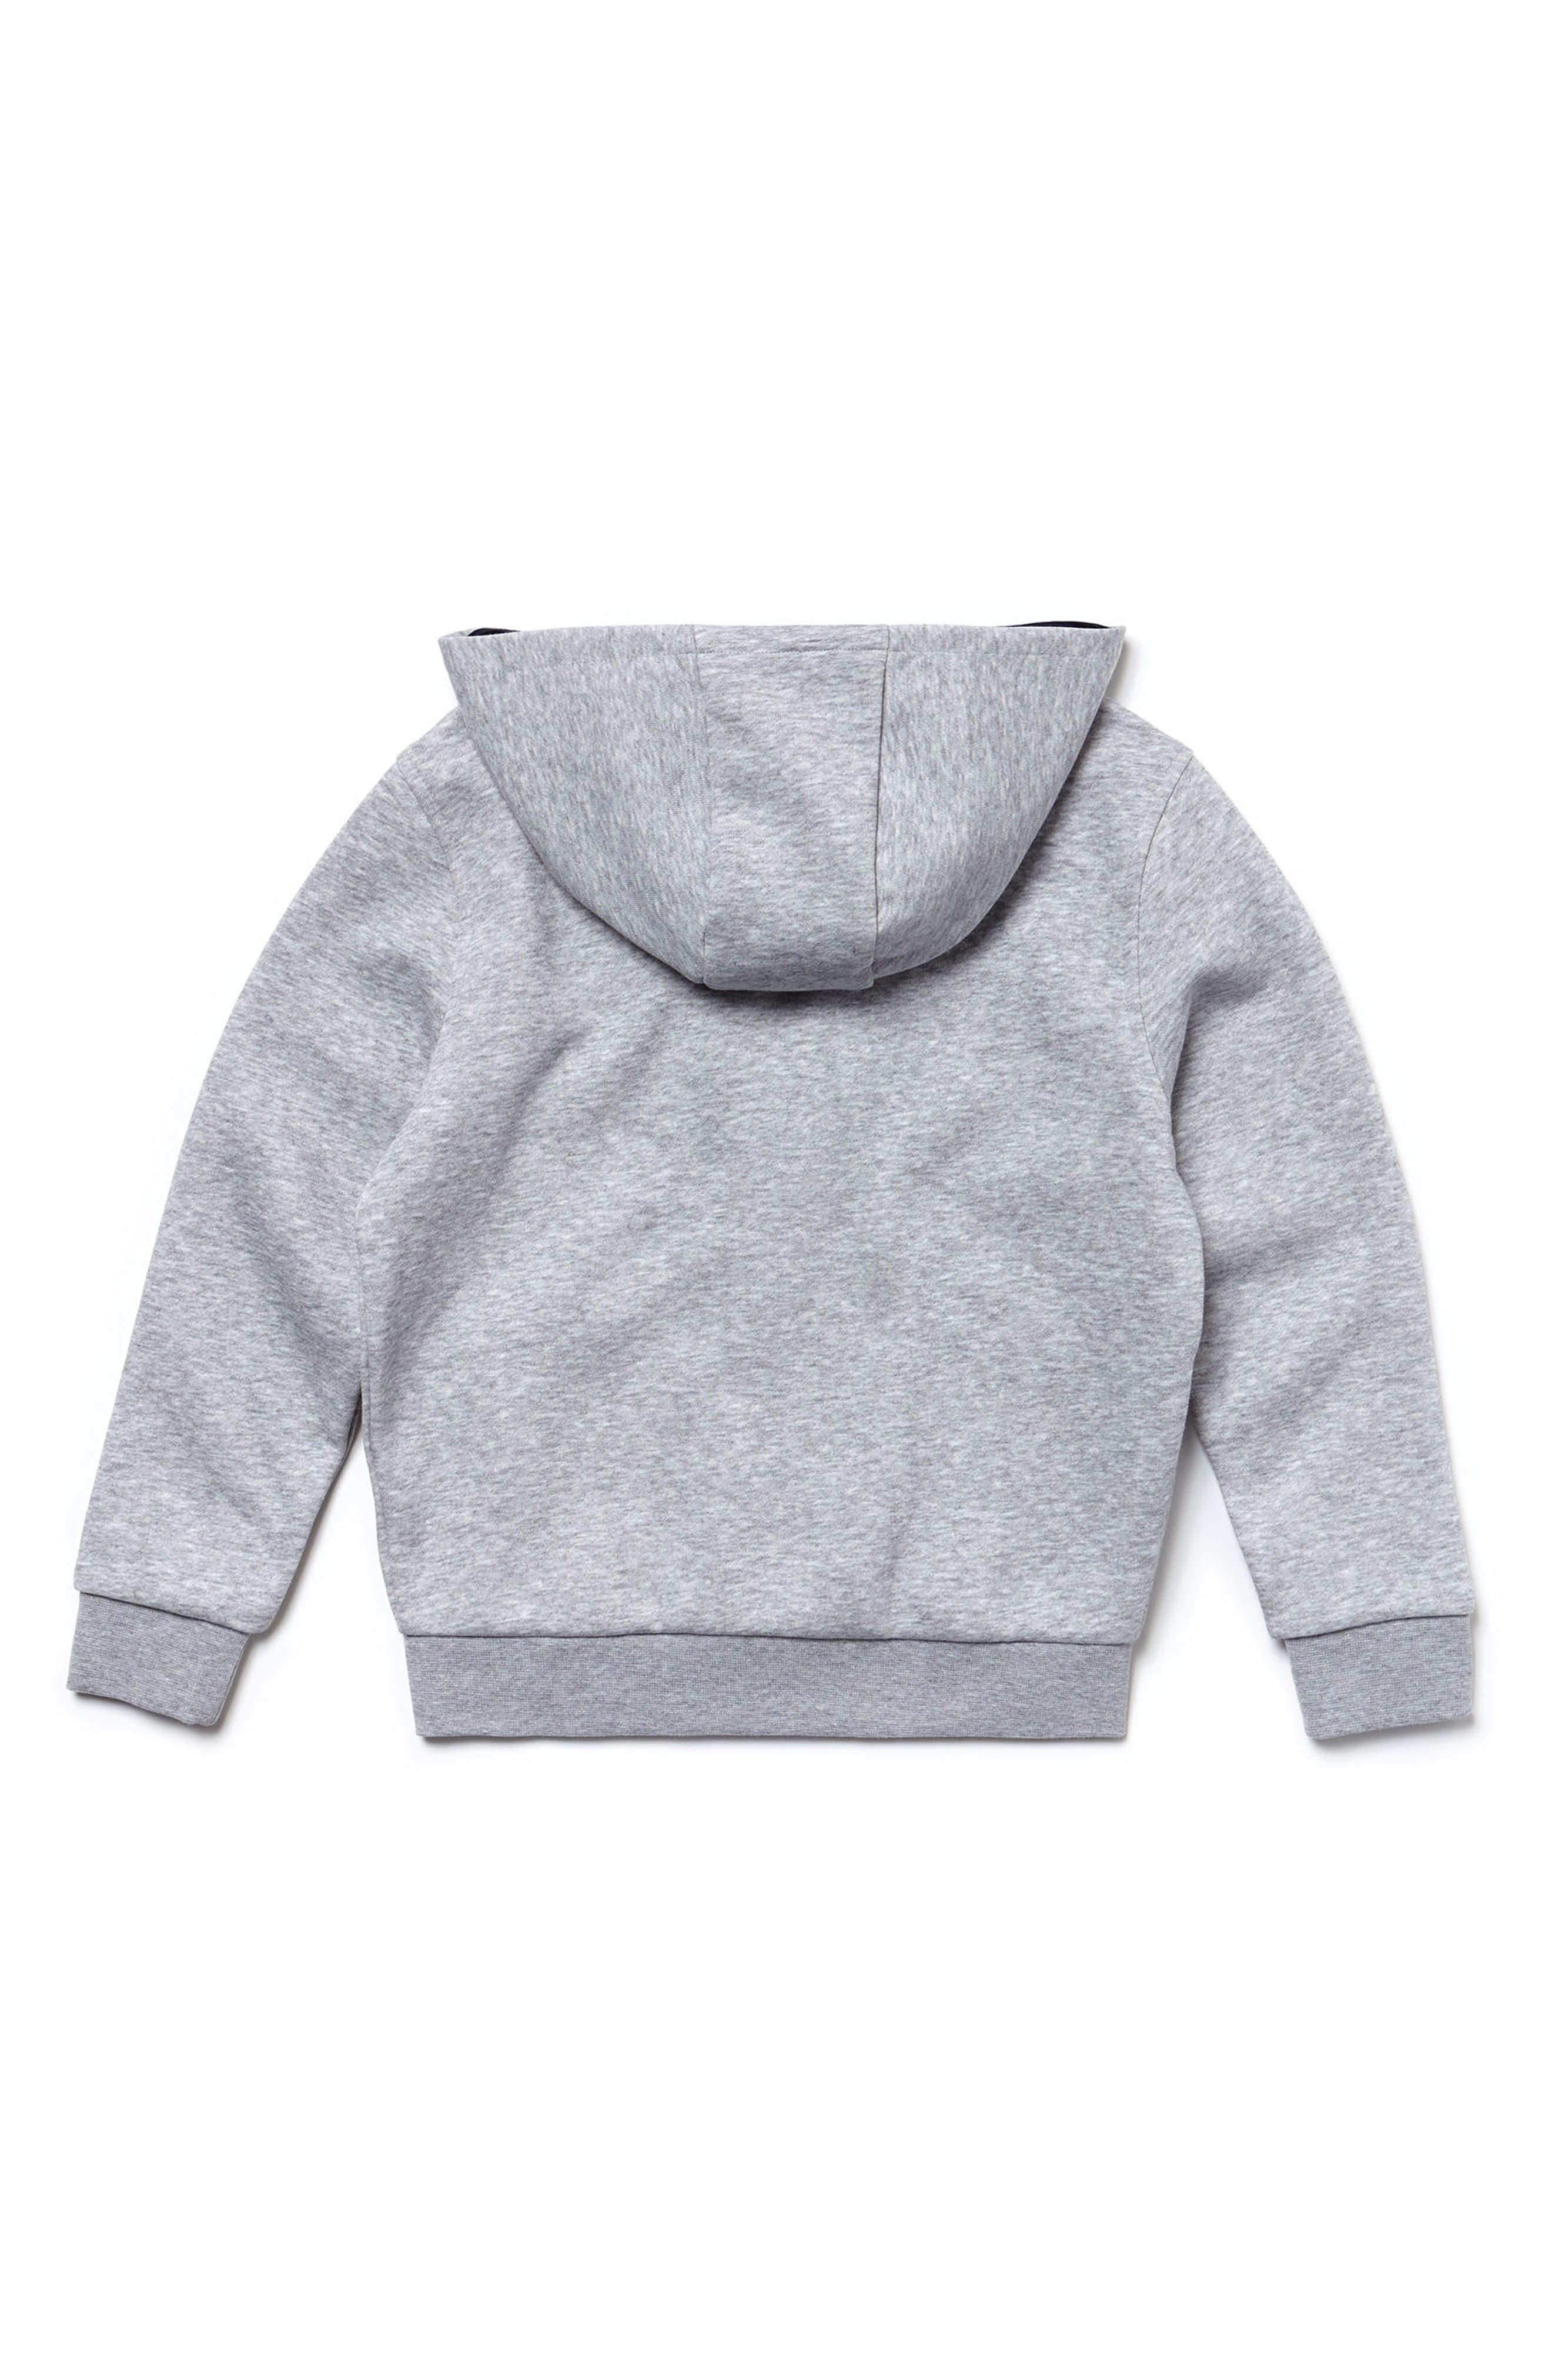 Sporty Fleece Full Zip Hoodie,                             Alternate thumbnail 2, color,                             020